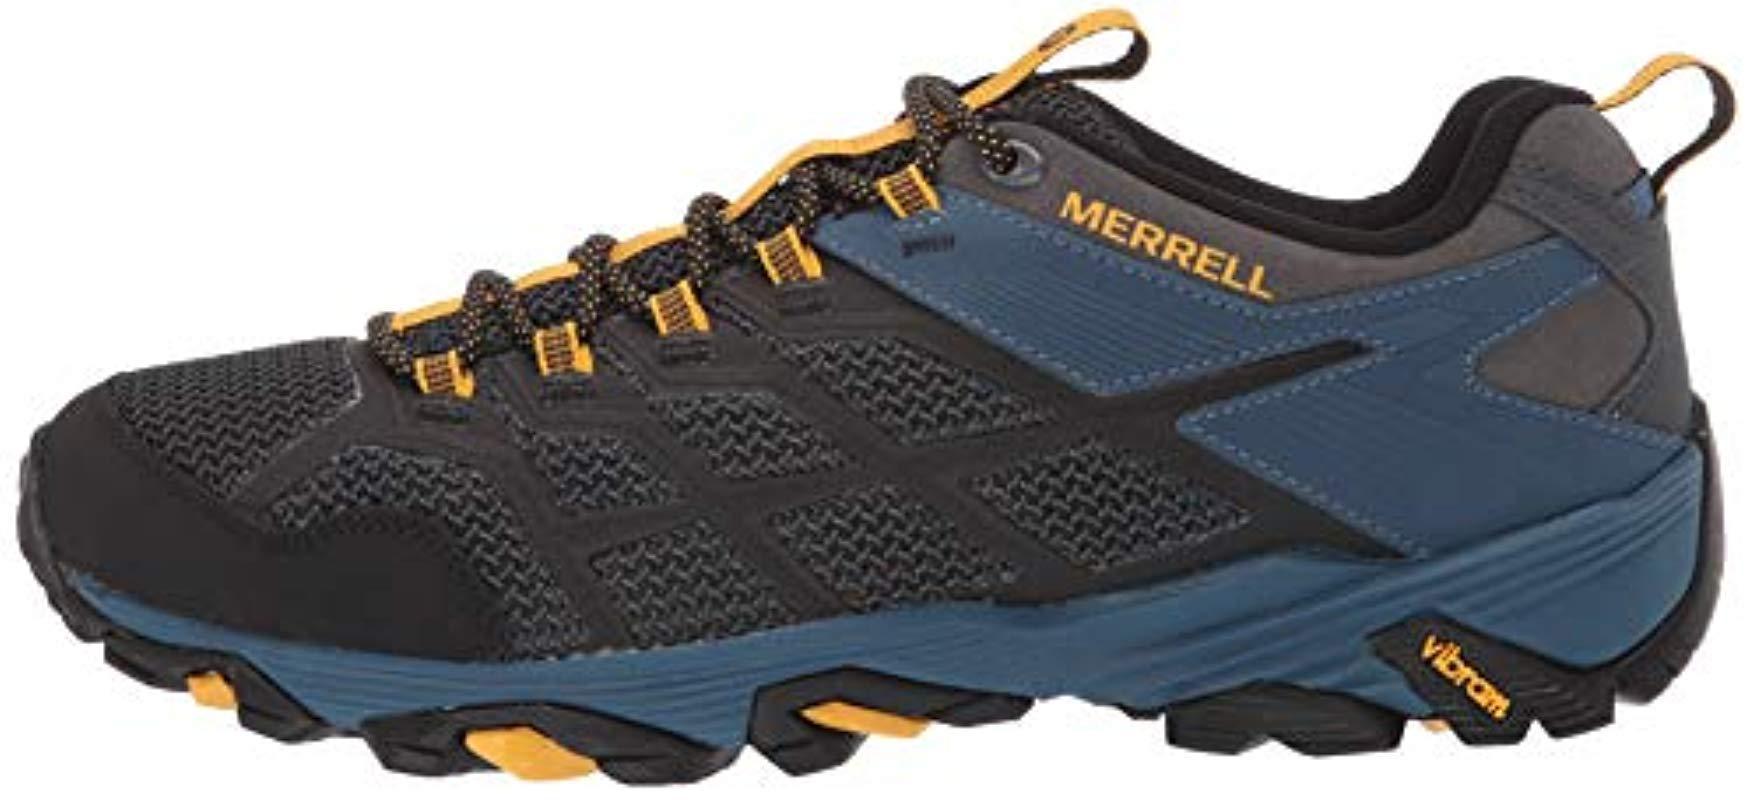 merrell moab fst 2 gore tex kings